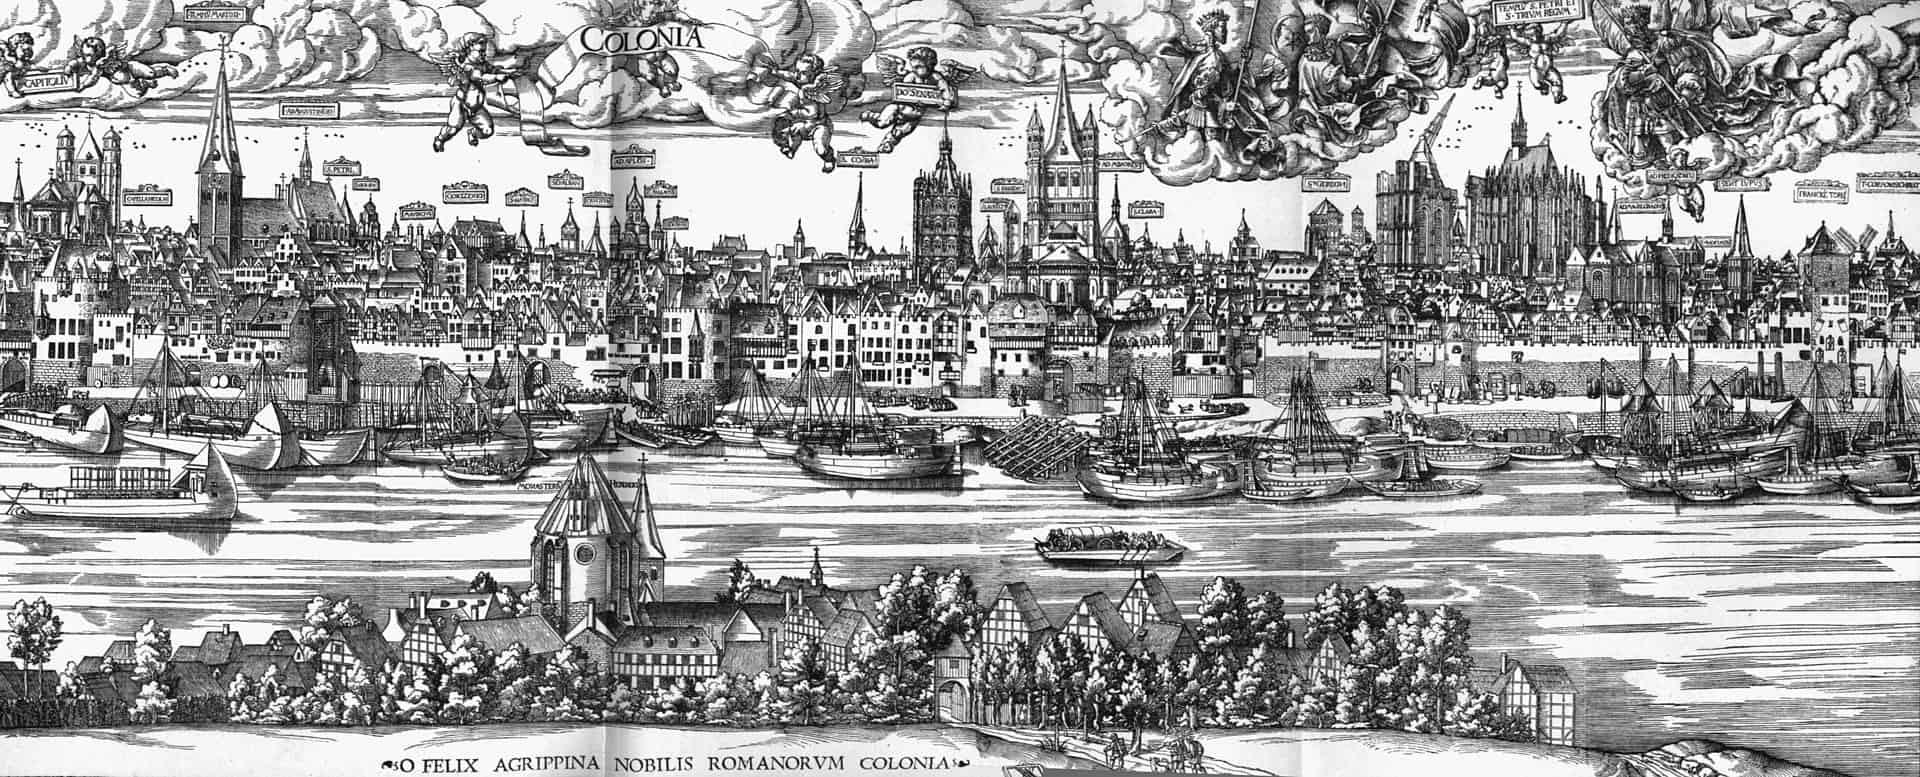 Антон фон Вормс. Панорама Кёльна с 1531 года